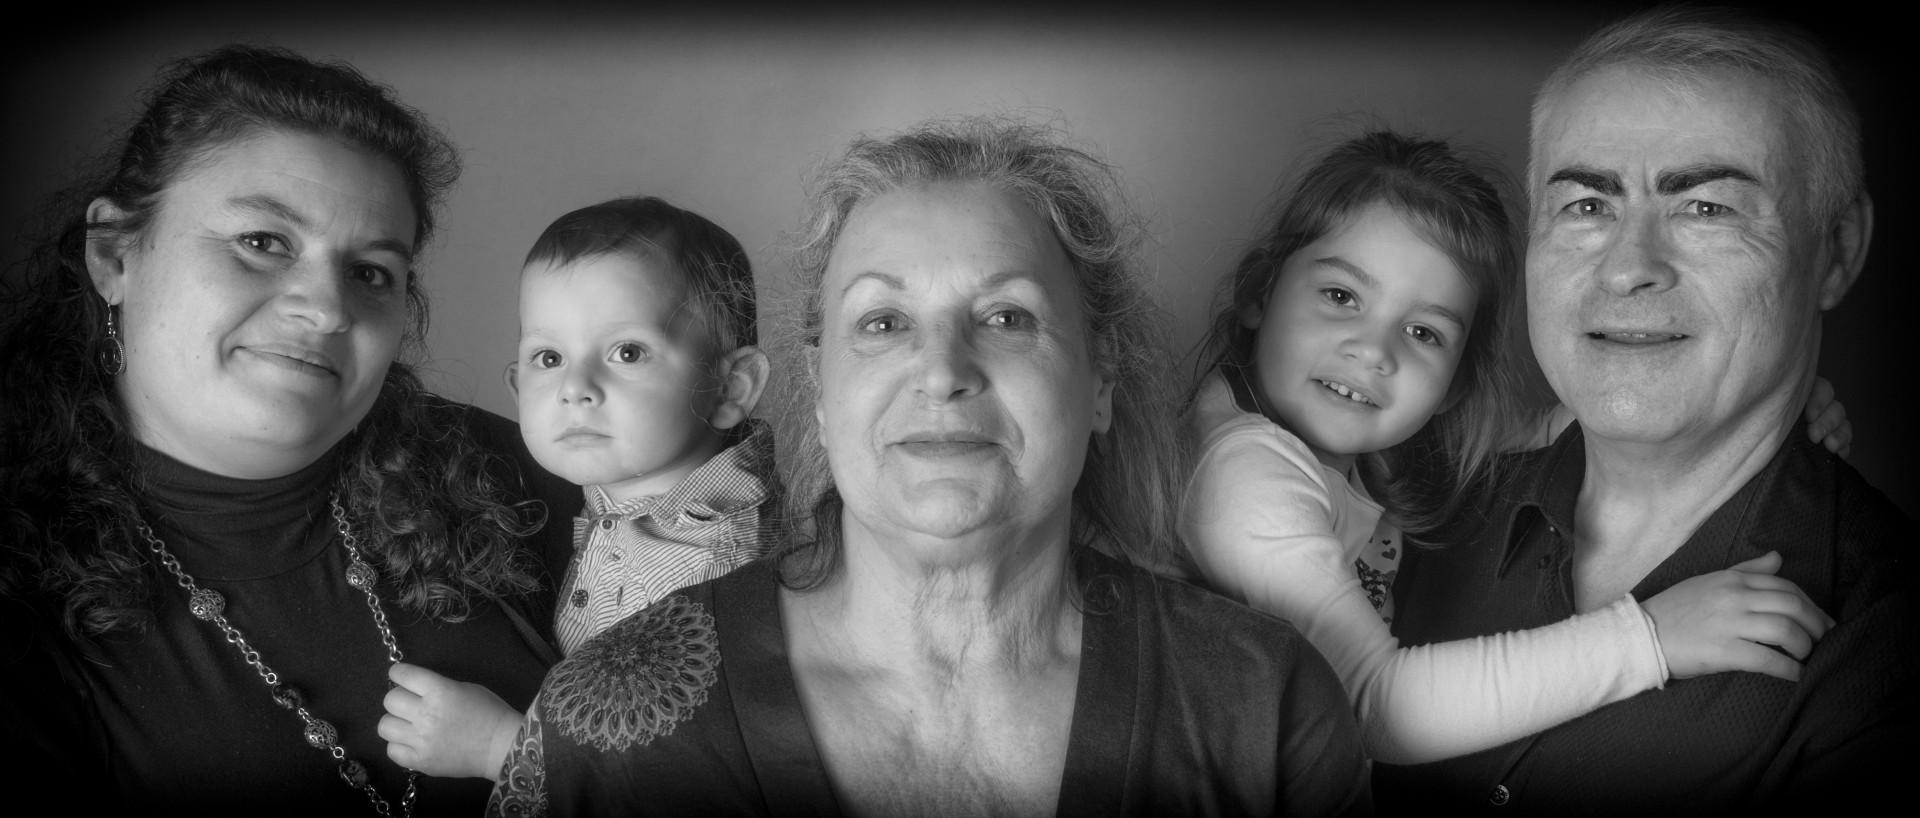 copyright © 2011 Dominique salier-11